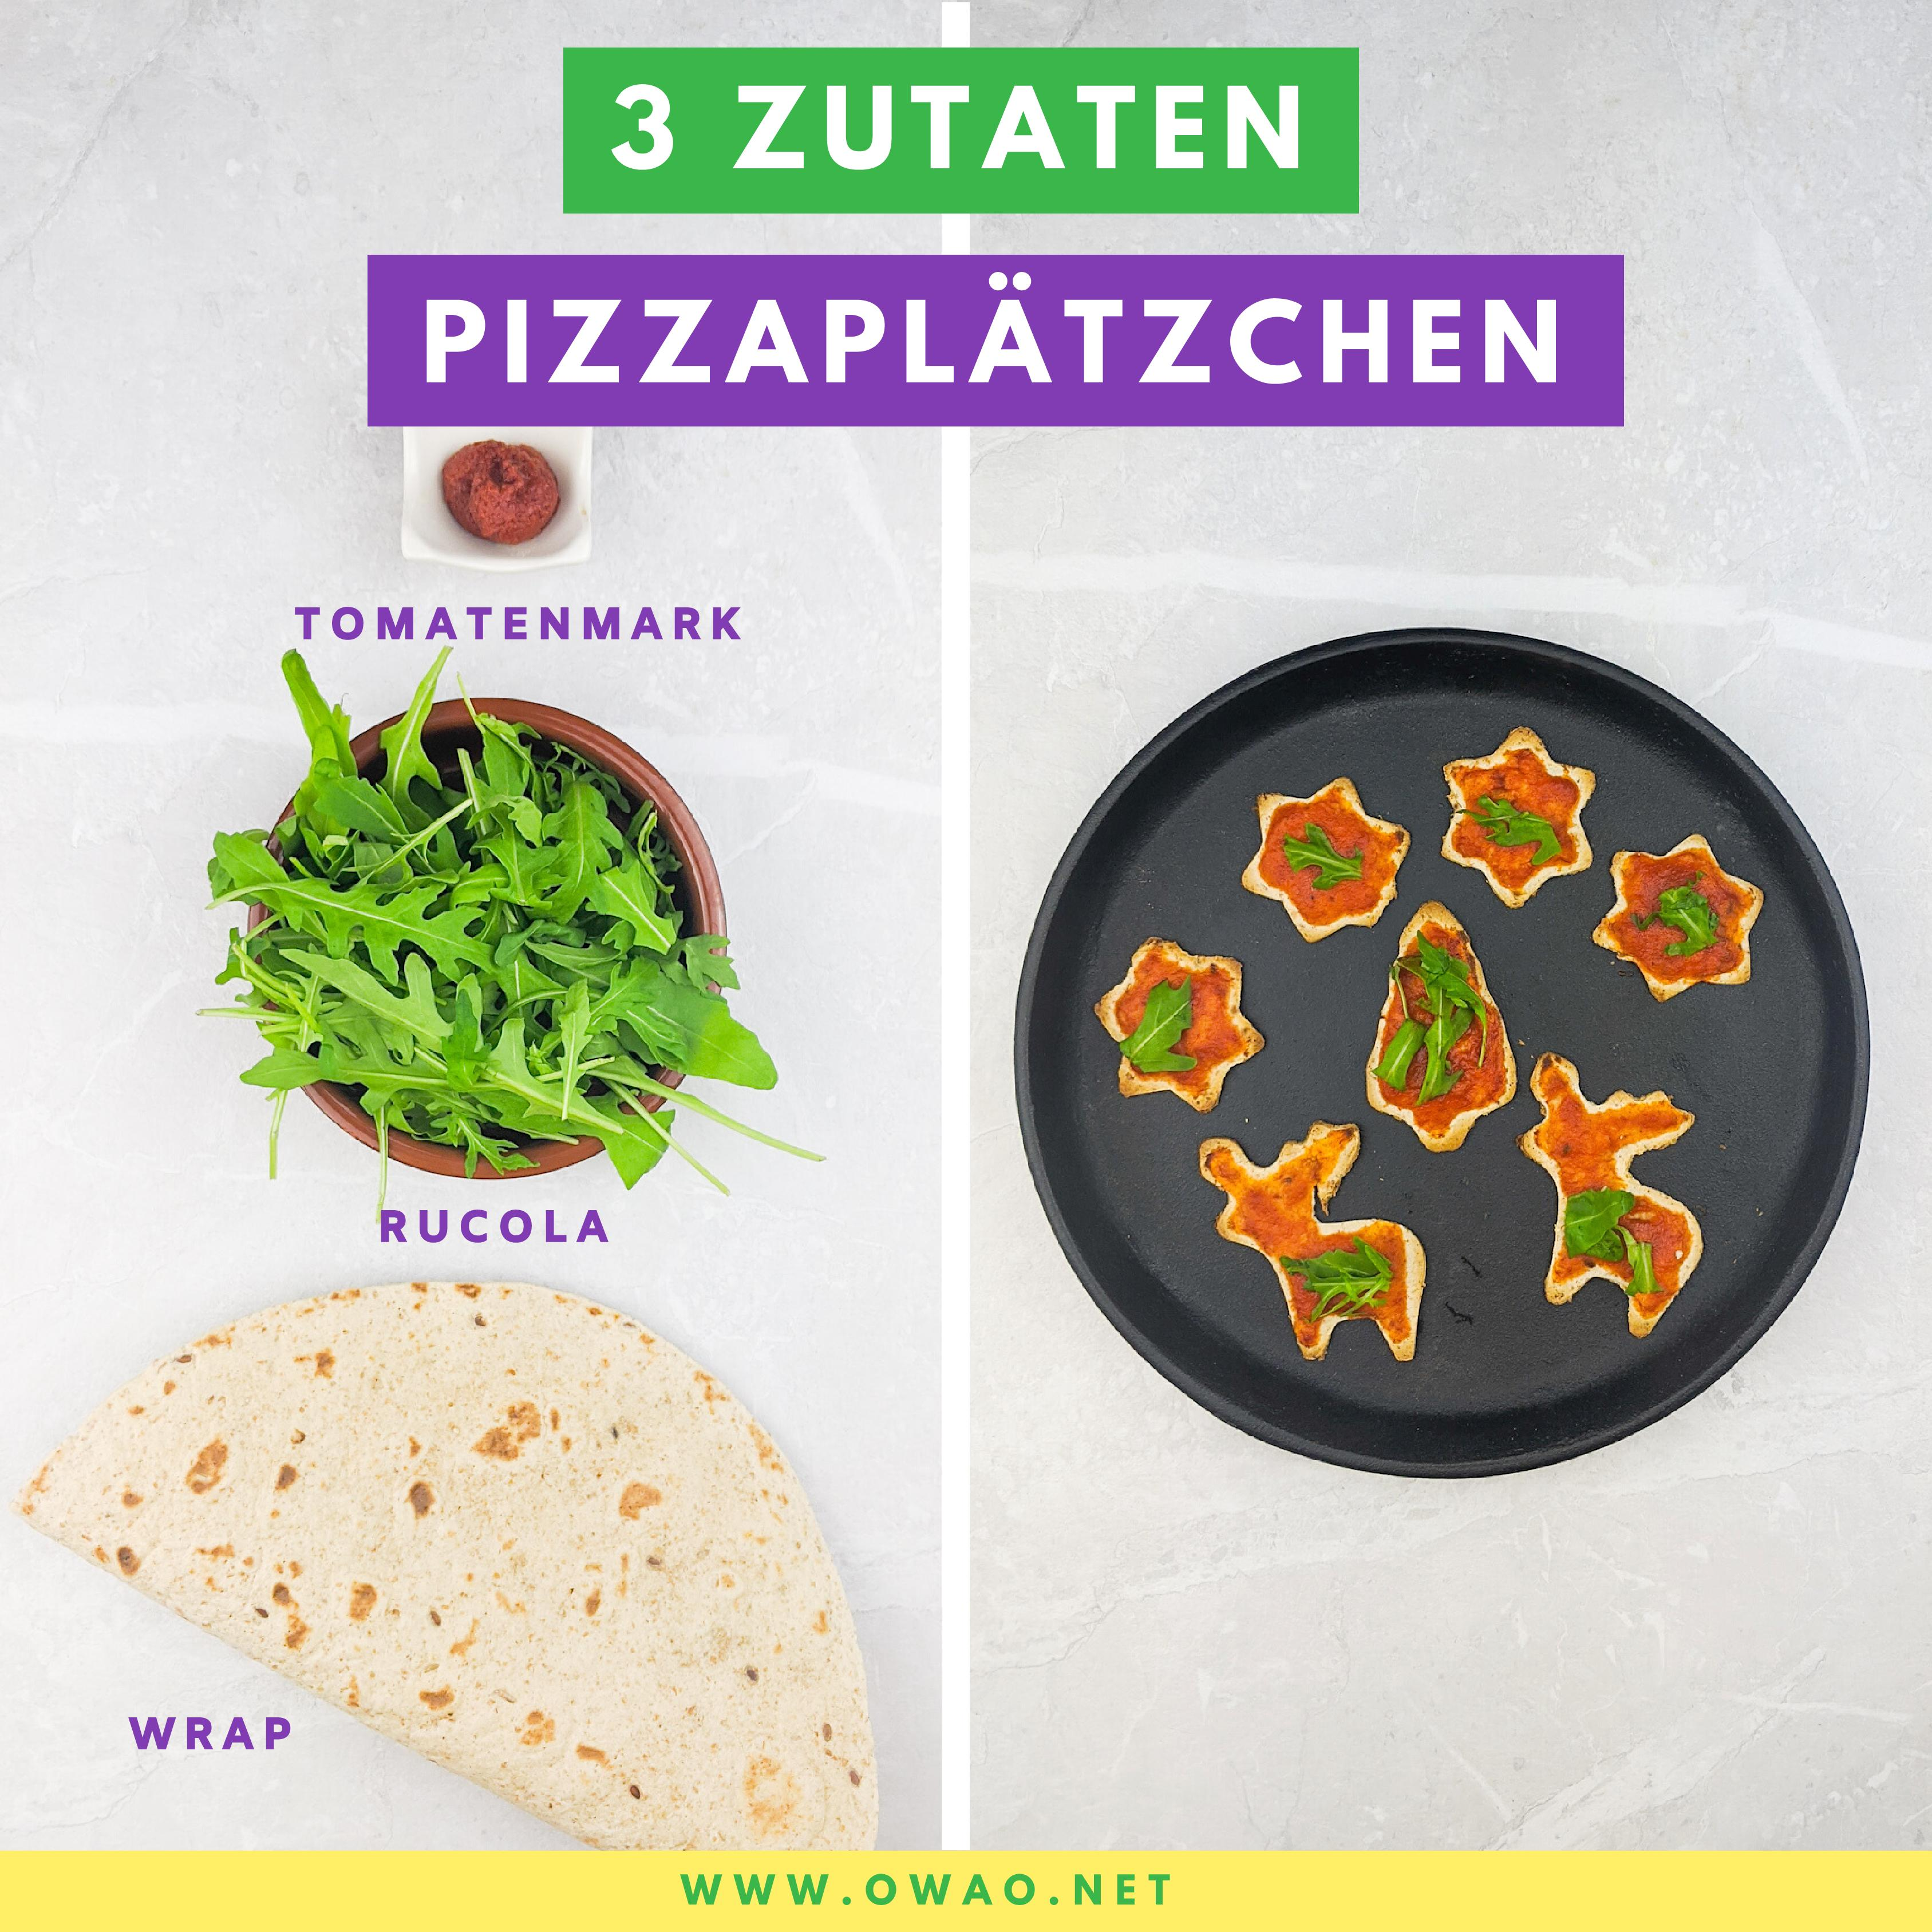 Weihnachtsplätzchen-Pizzaplätzchen-OWAO!-Meal Prep-Meal Prep vegan